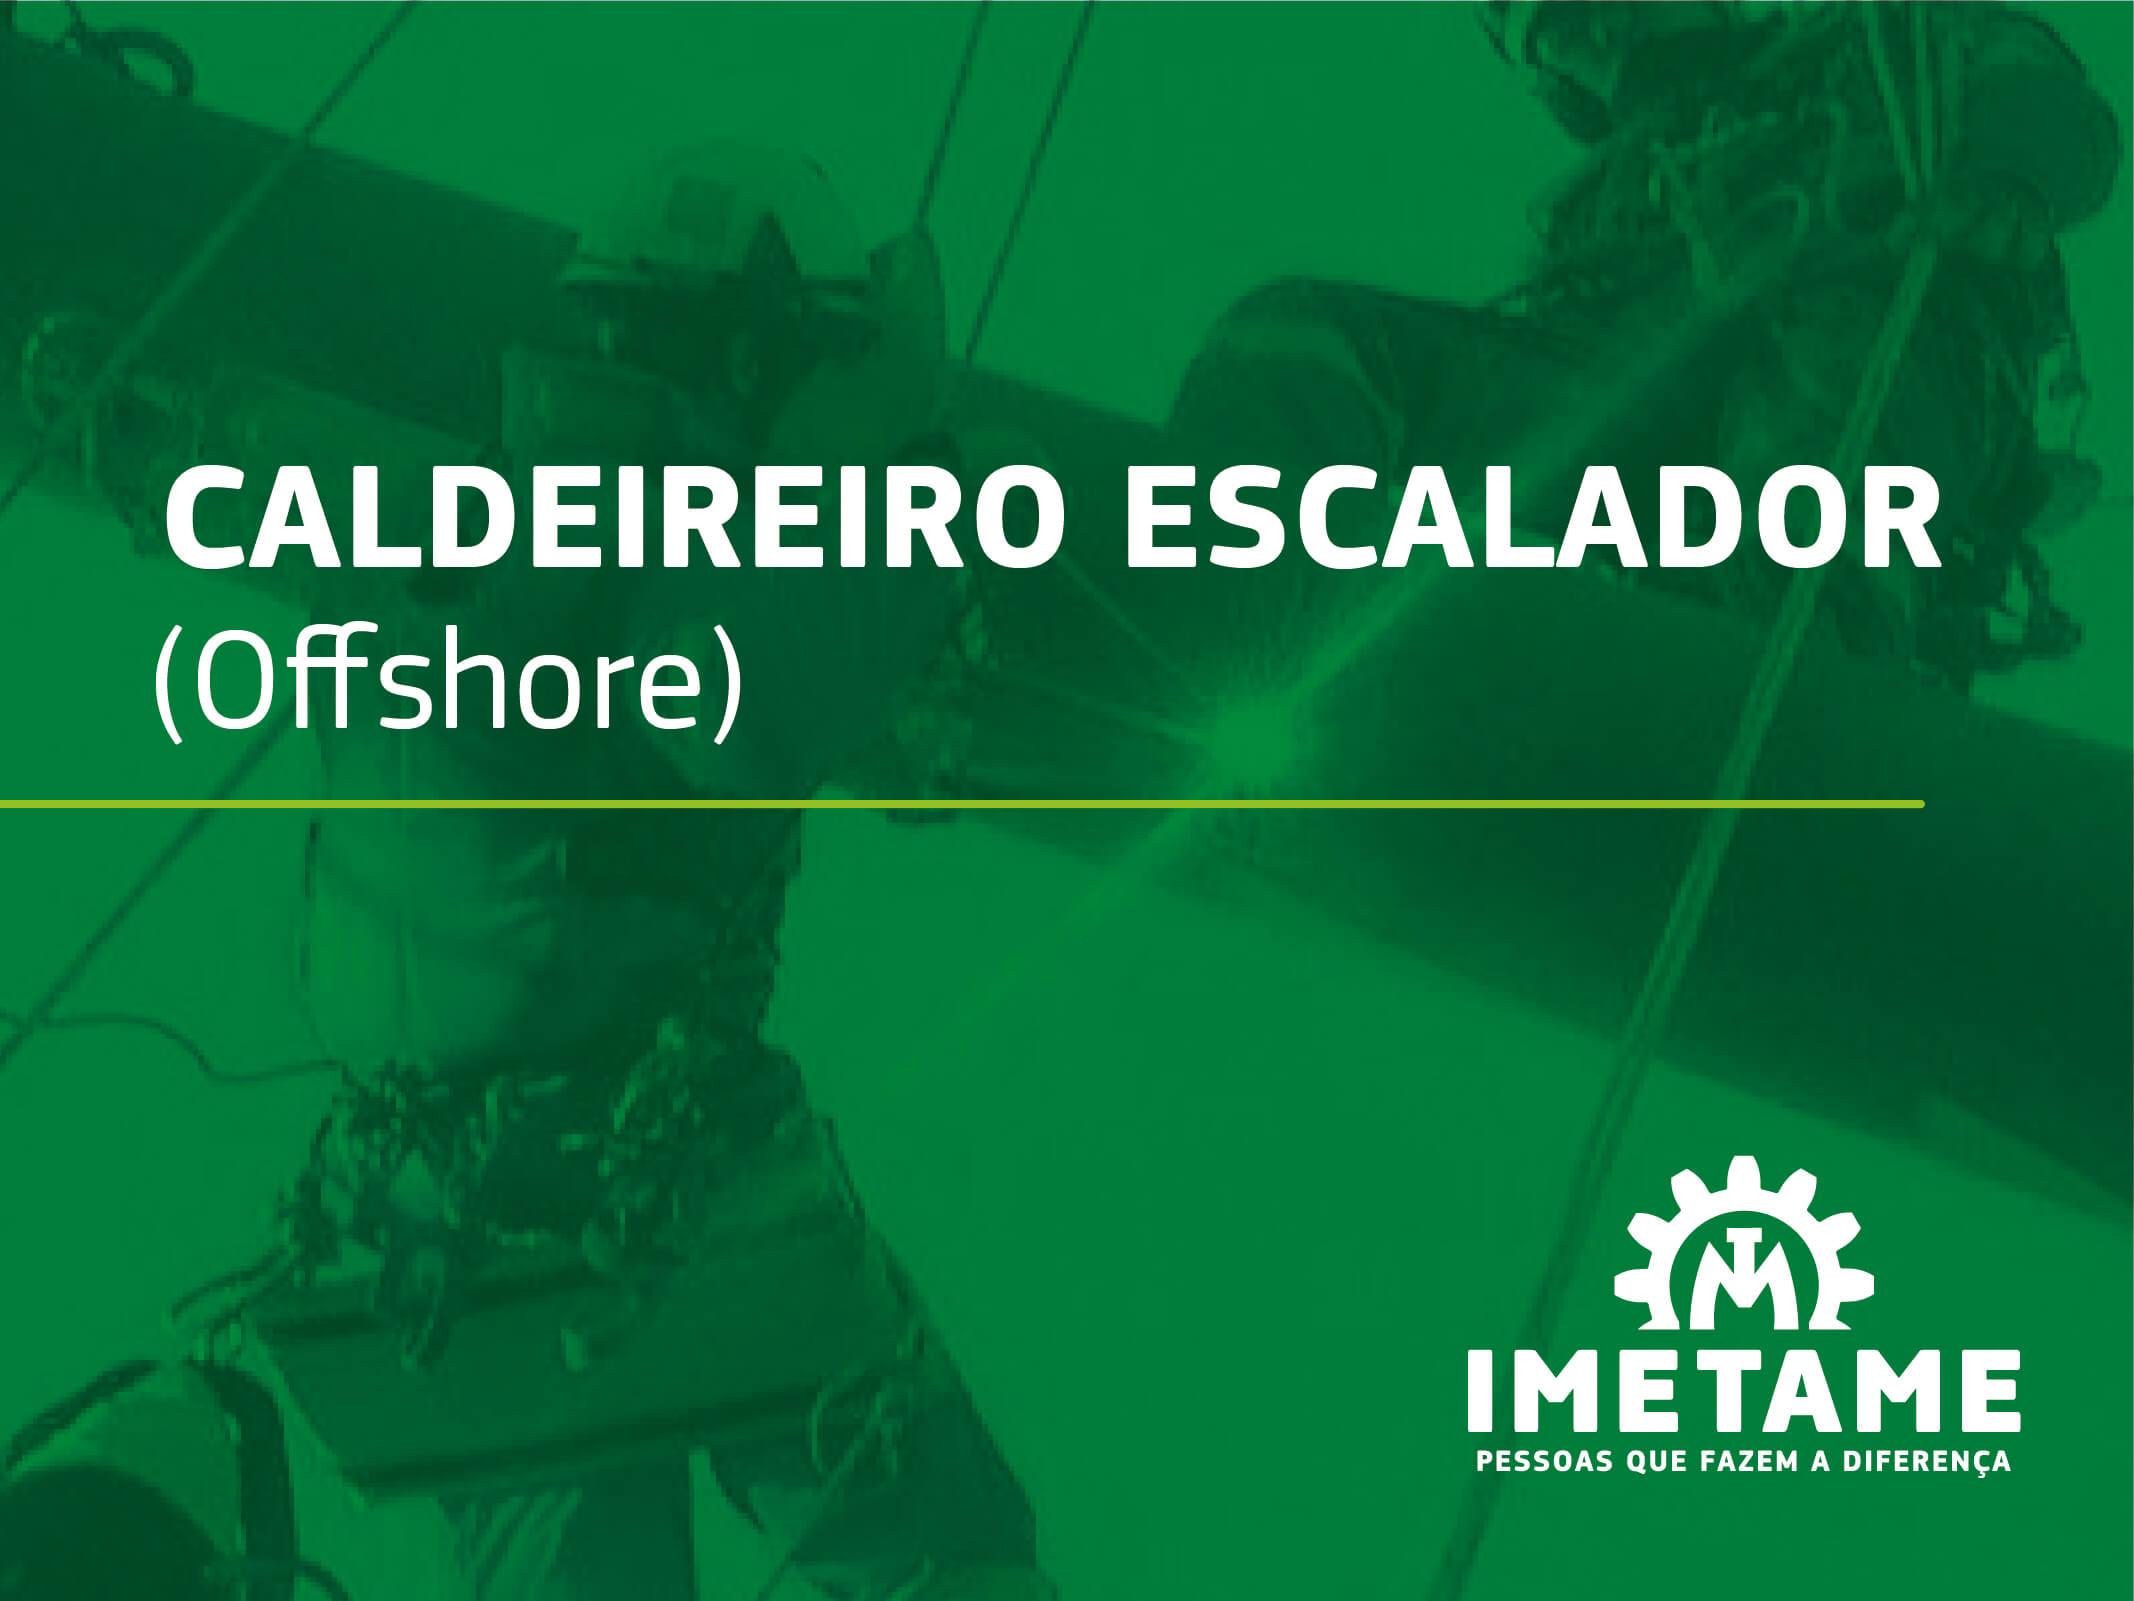 Caldeireiro Escalador – Offshore